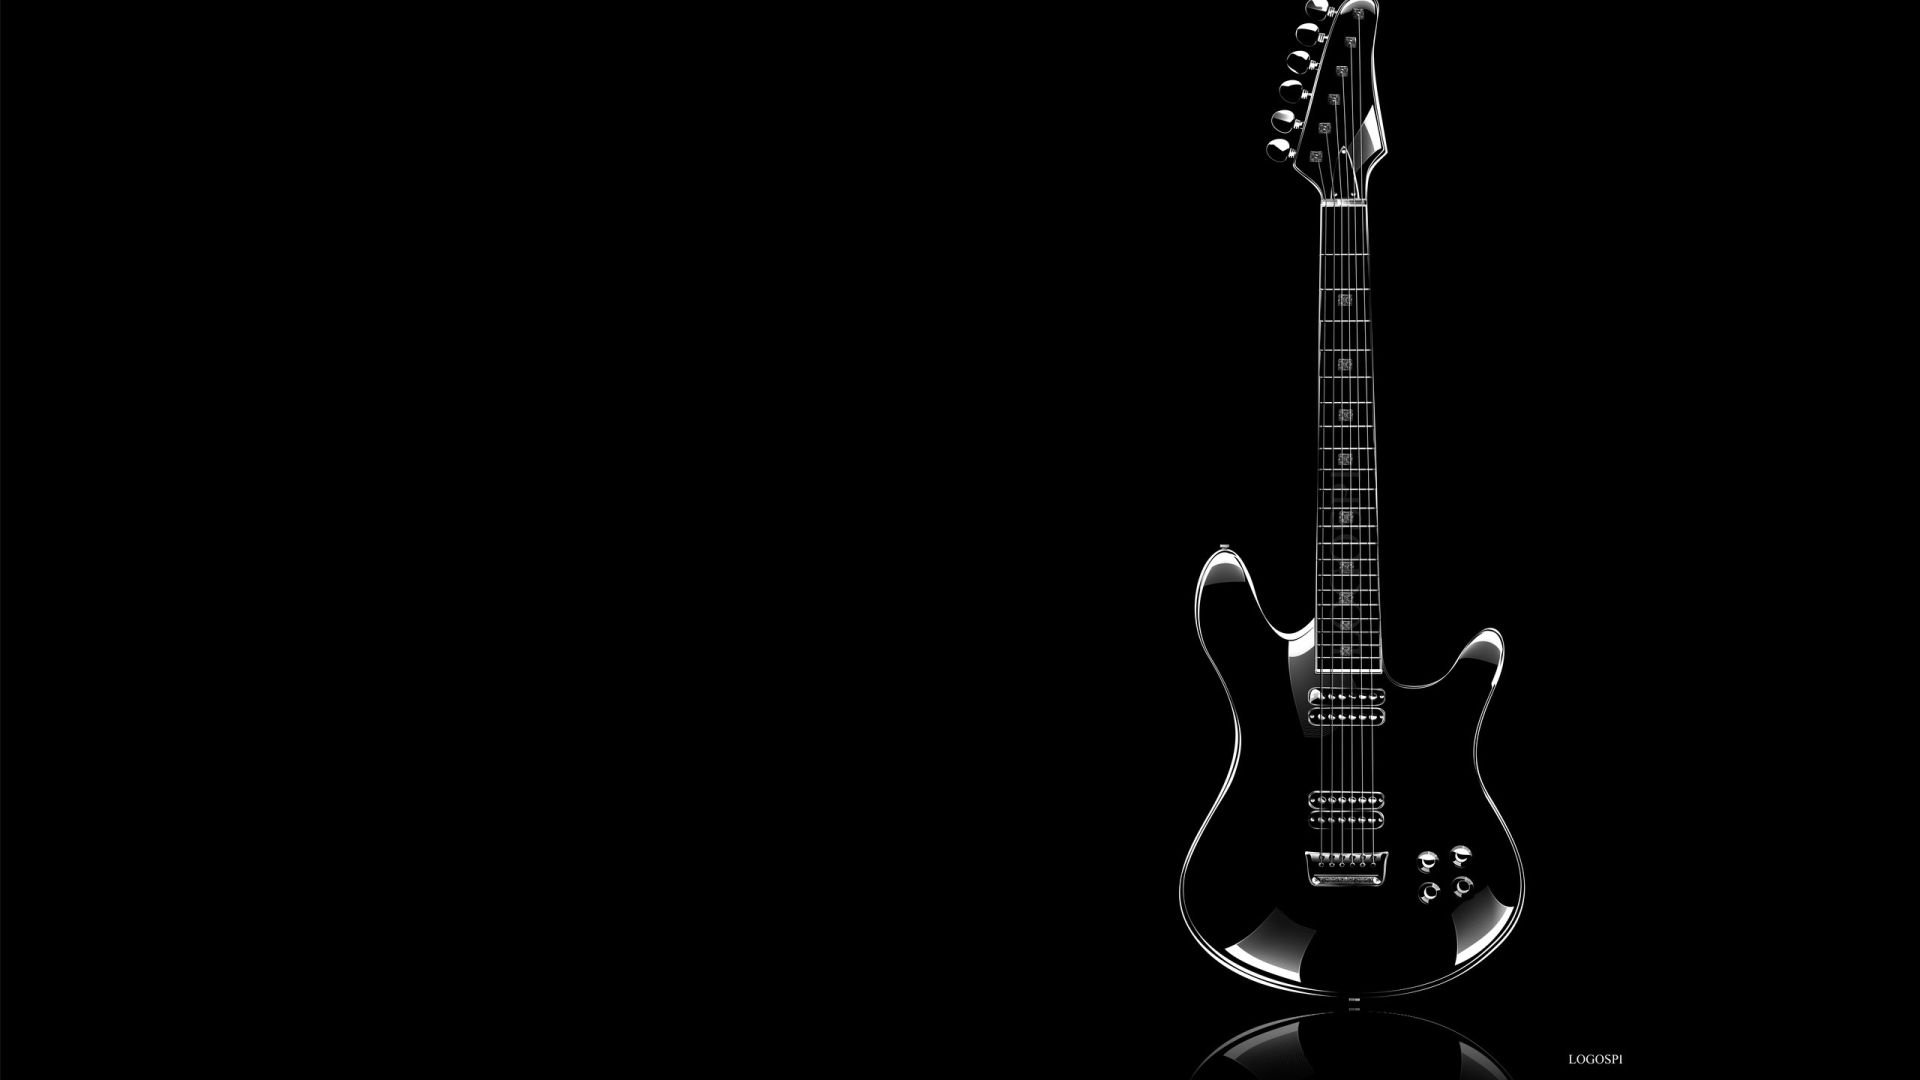 Electric Guitar Black, Cool HD Wallpaper